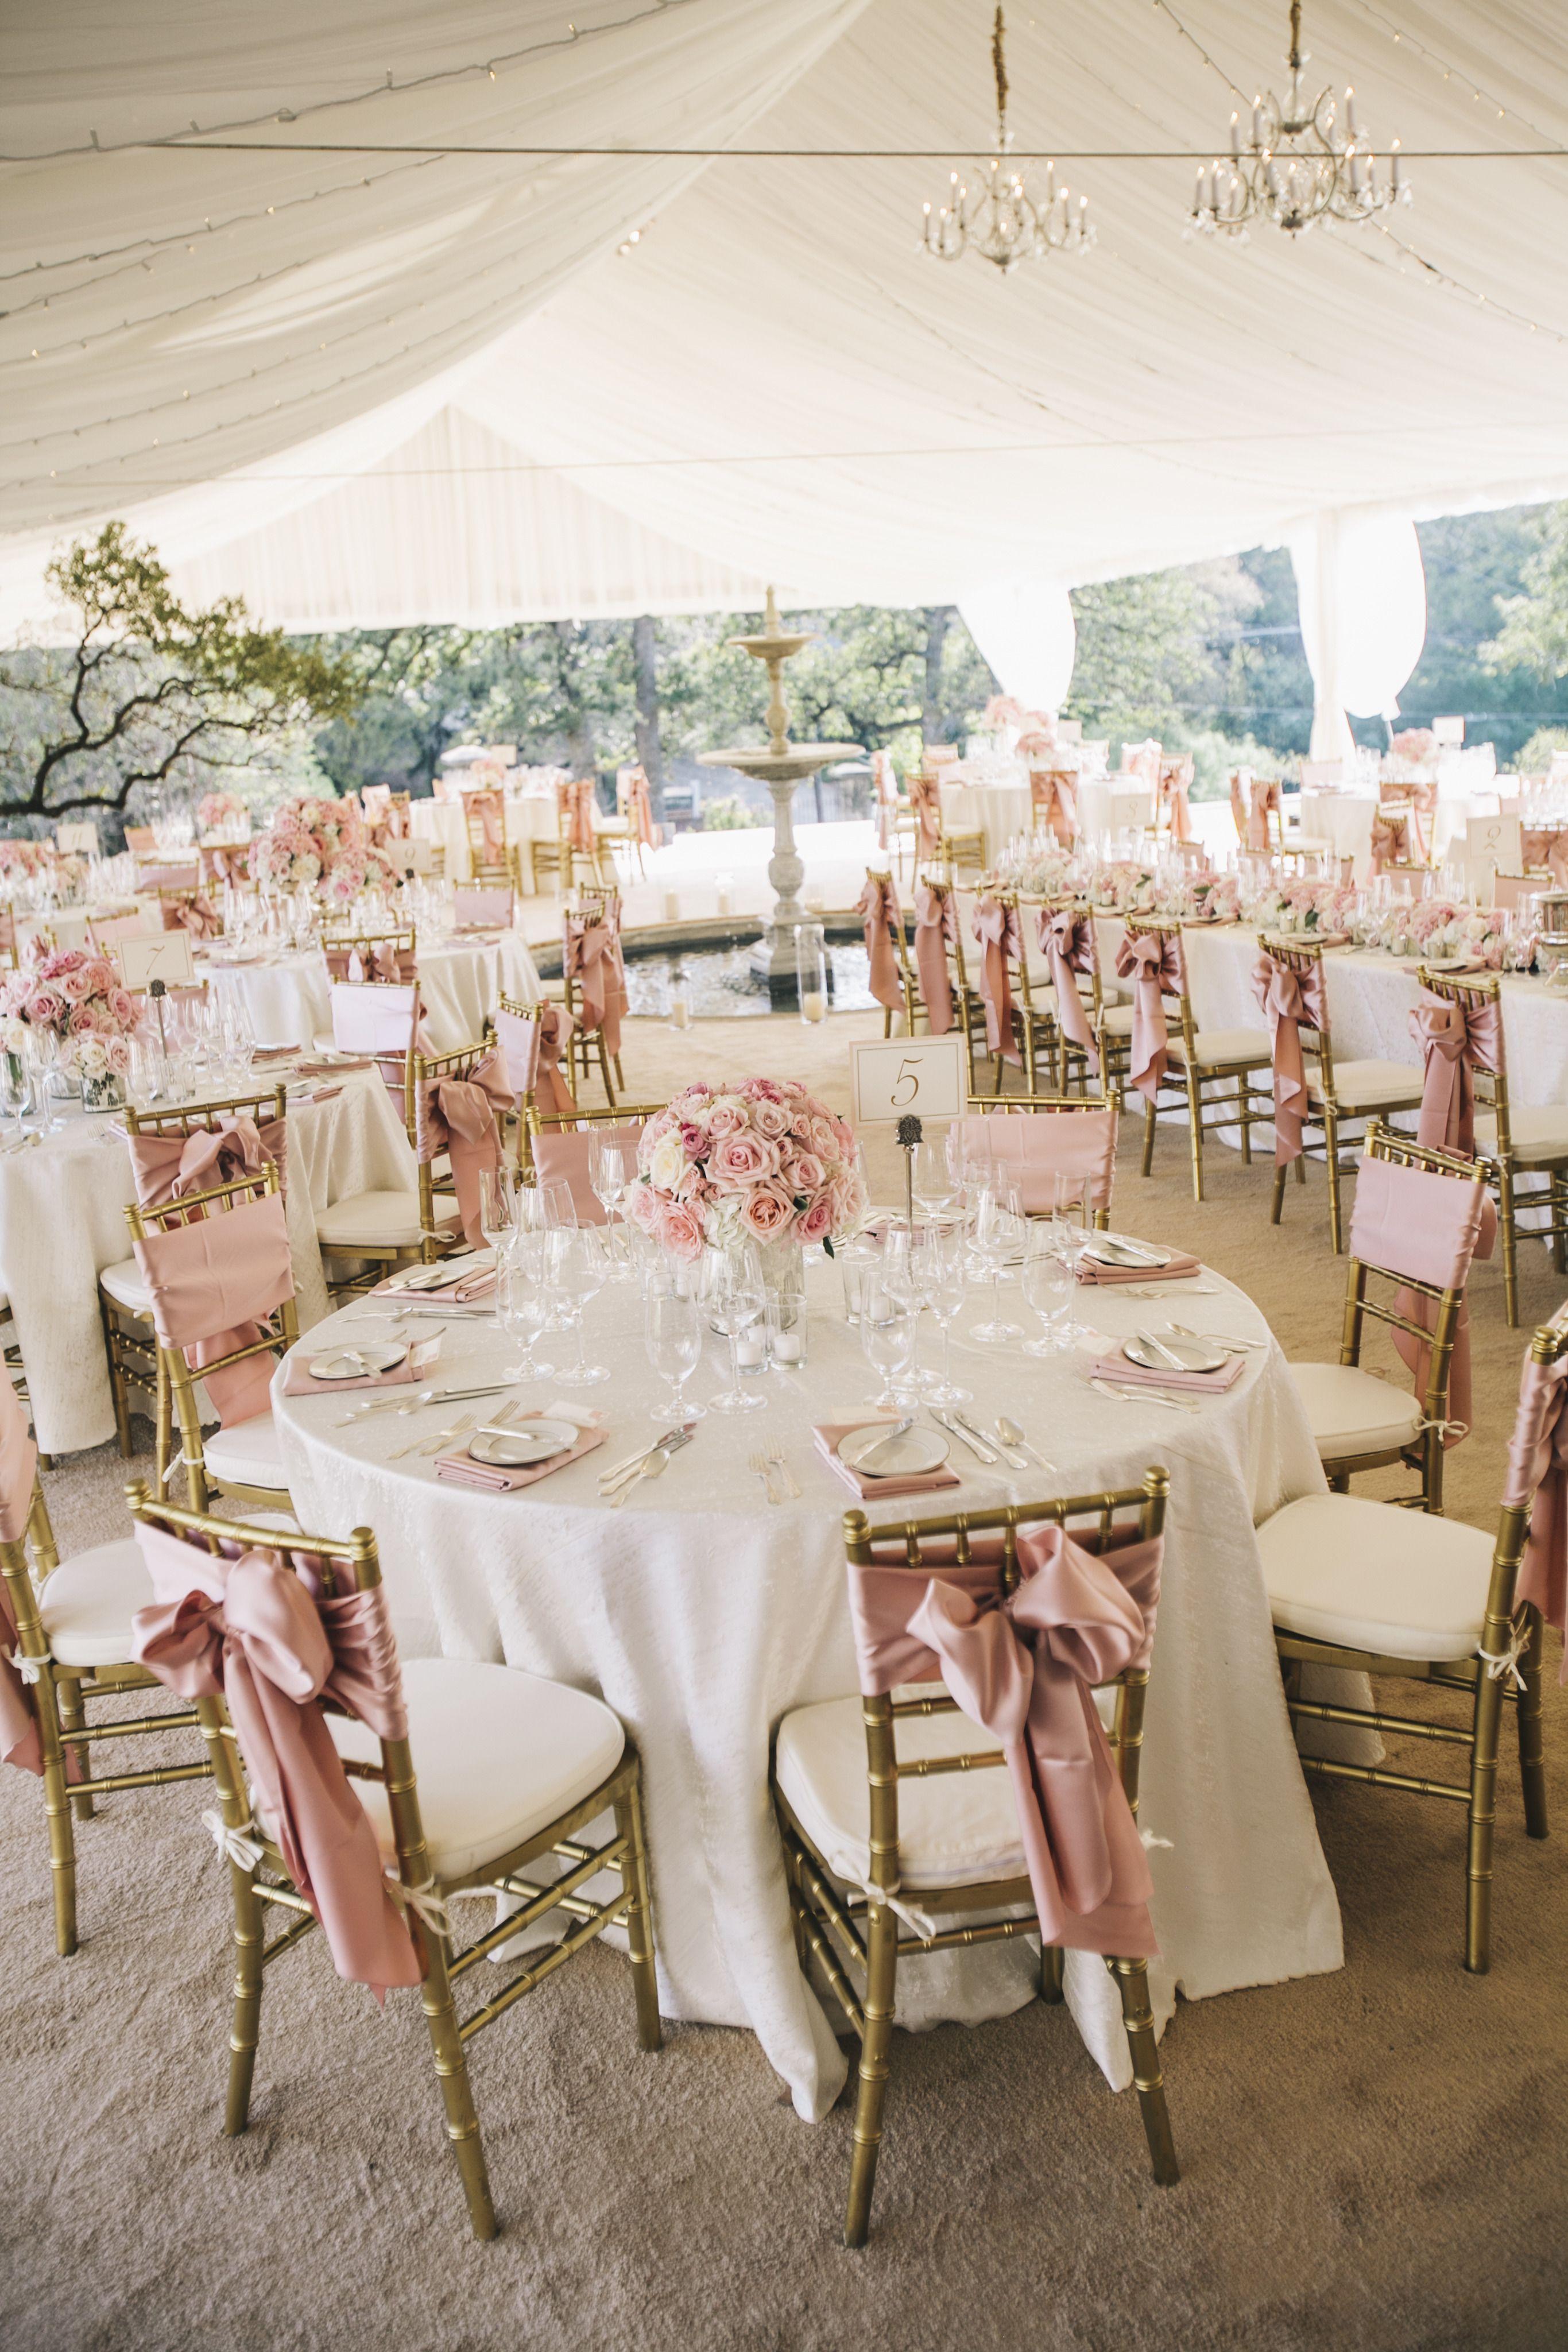 pink wedding decorations quinceanera decorations wedding reception table decorations weding decoration pink